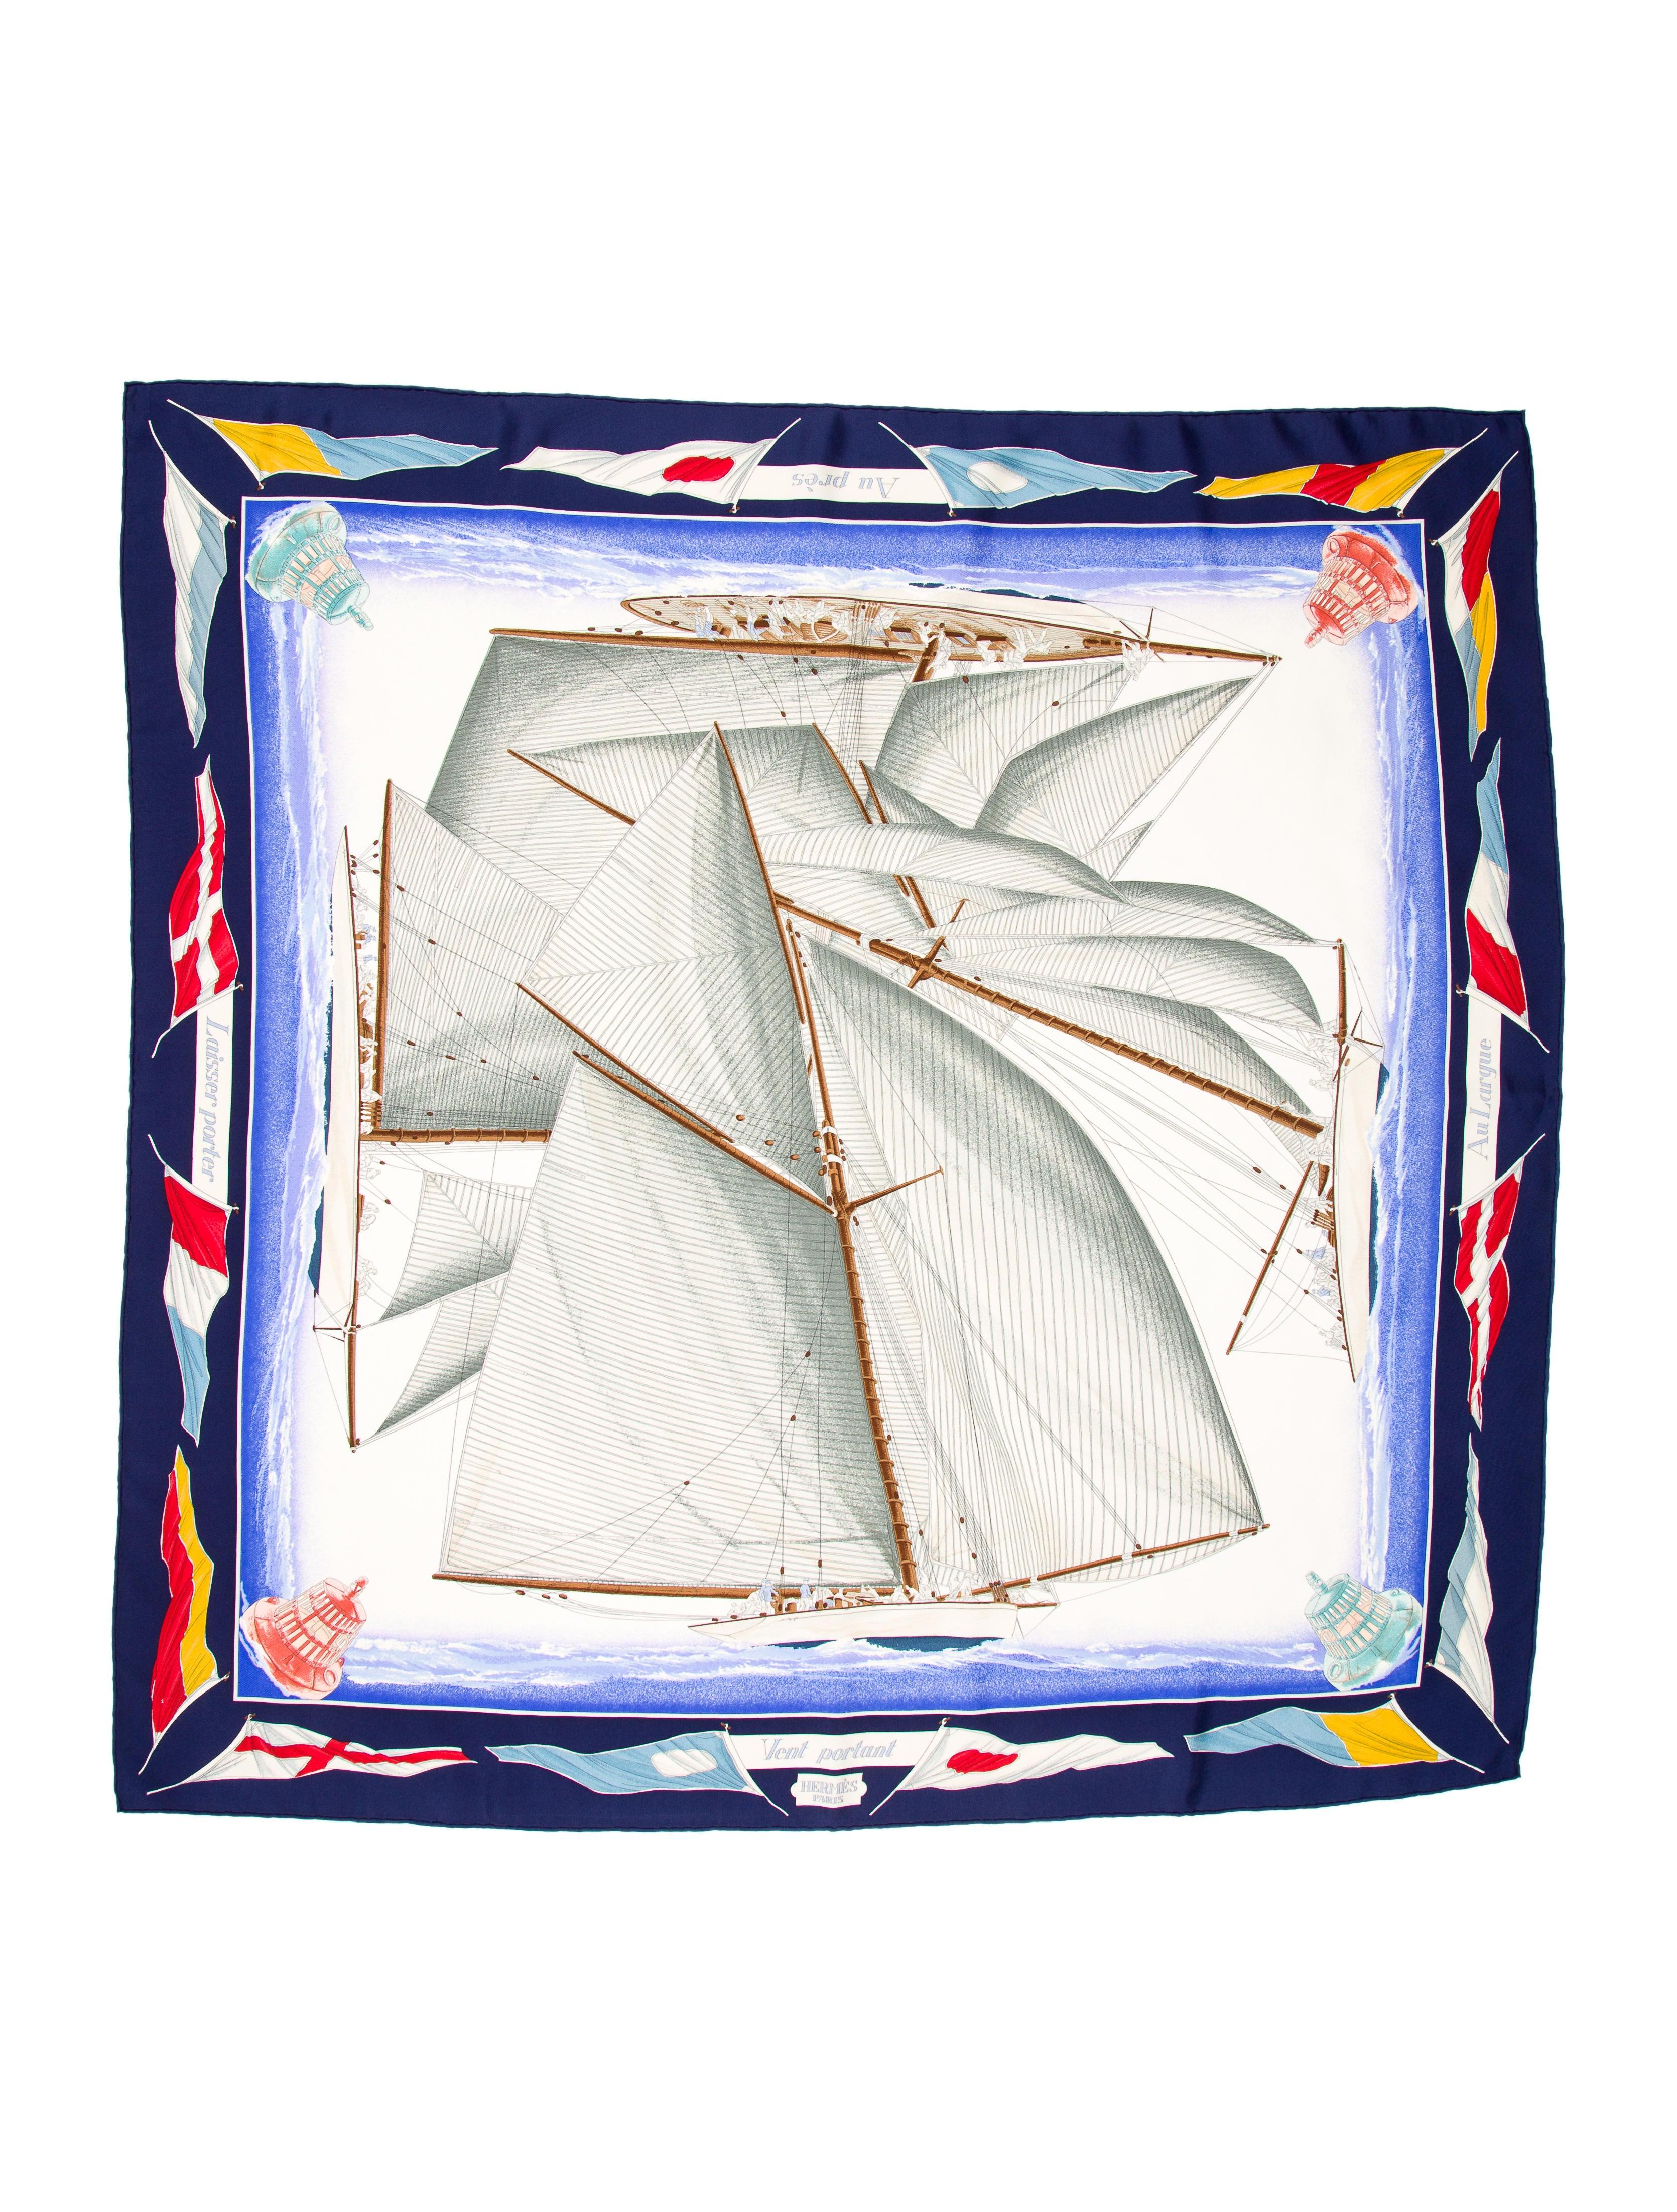 herm s vent portant silk scarf accessories her88931. Black Bedroom Furniture Sets. Home Design Ideas